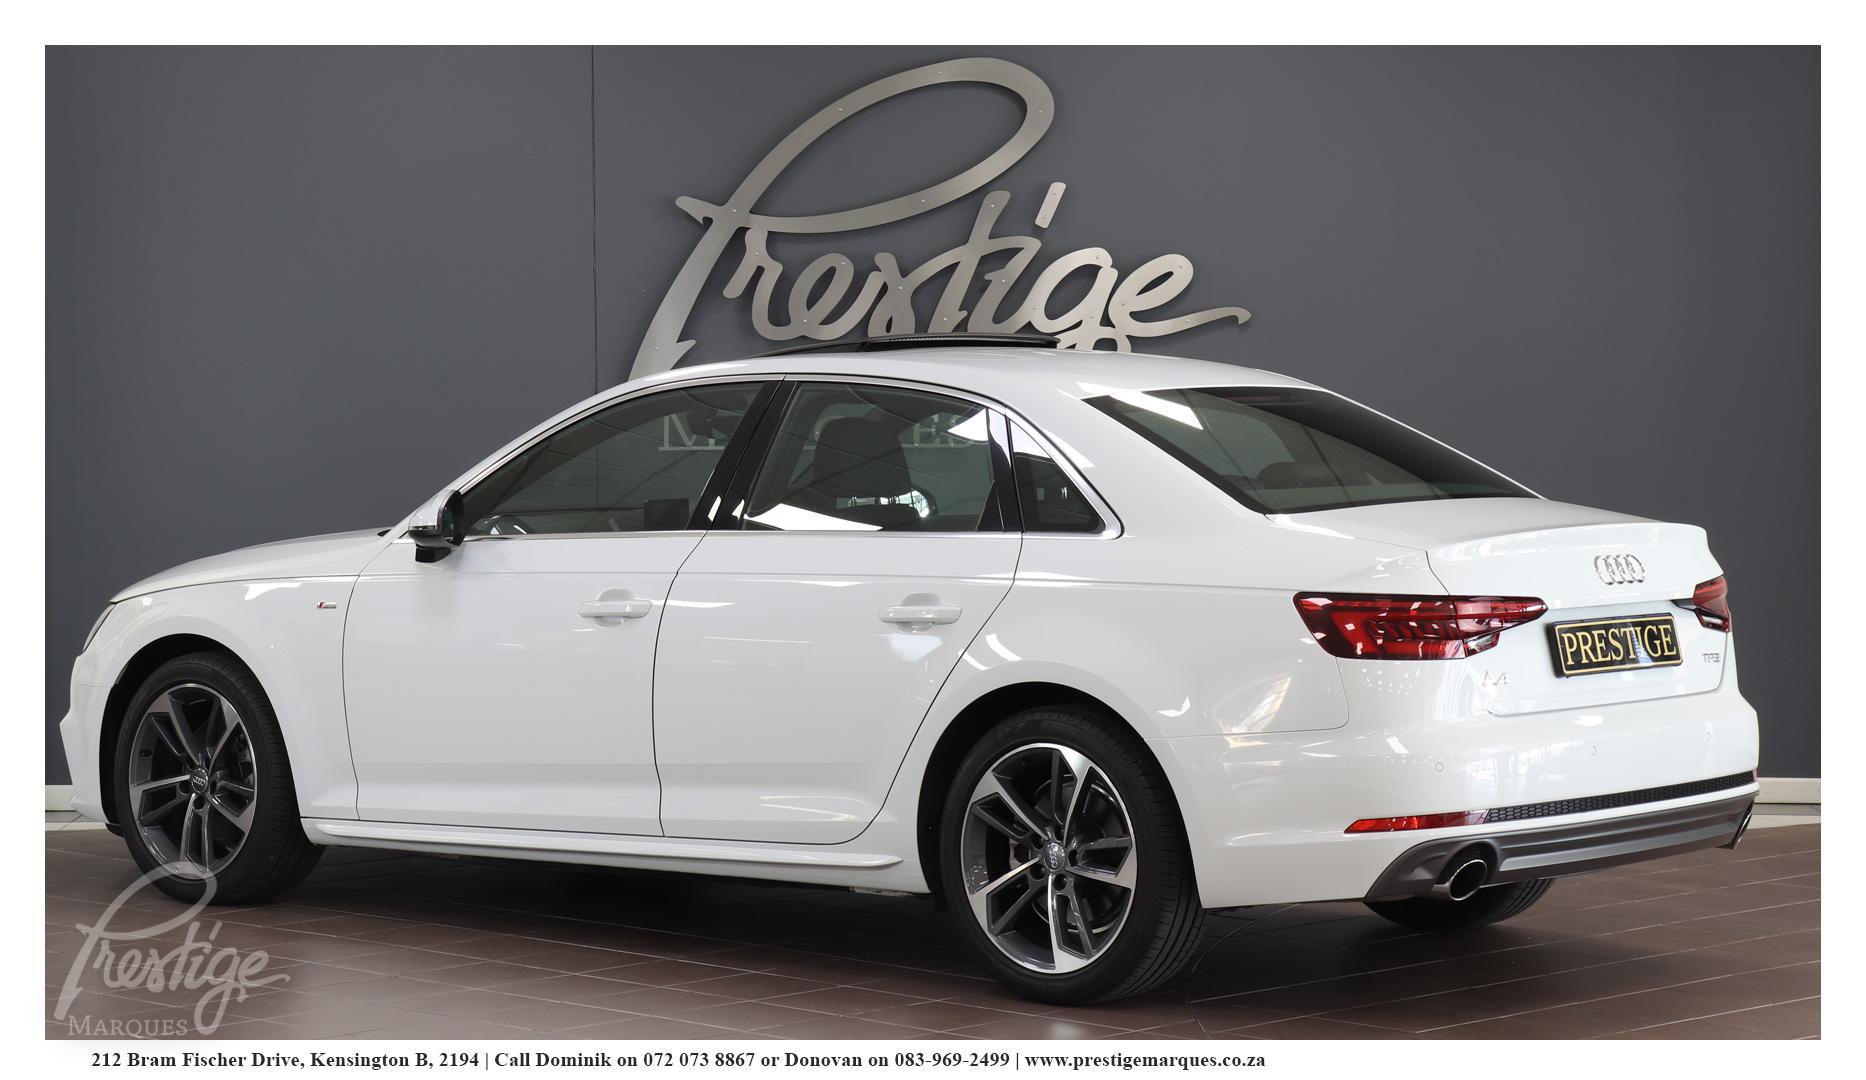 2018-Audi-A4-20-TFSI-STRONIC-Prestige-Marques-5